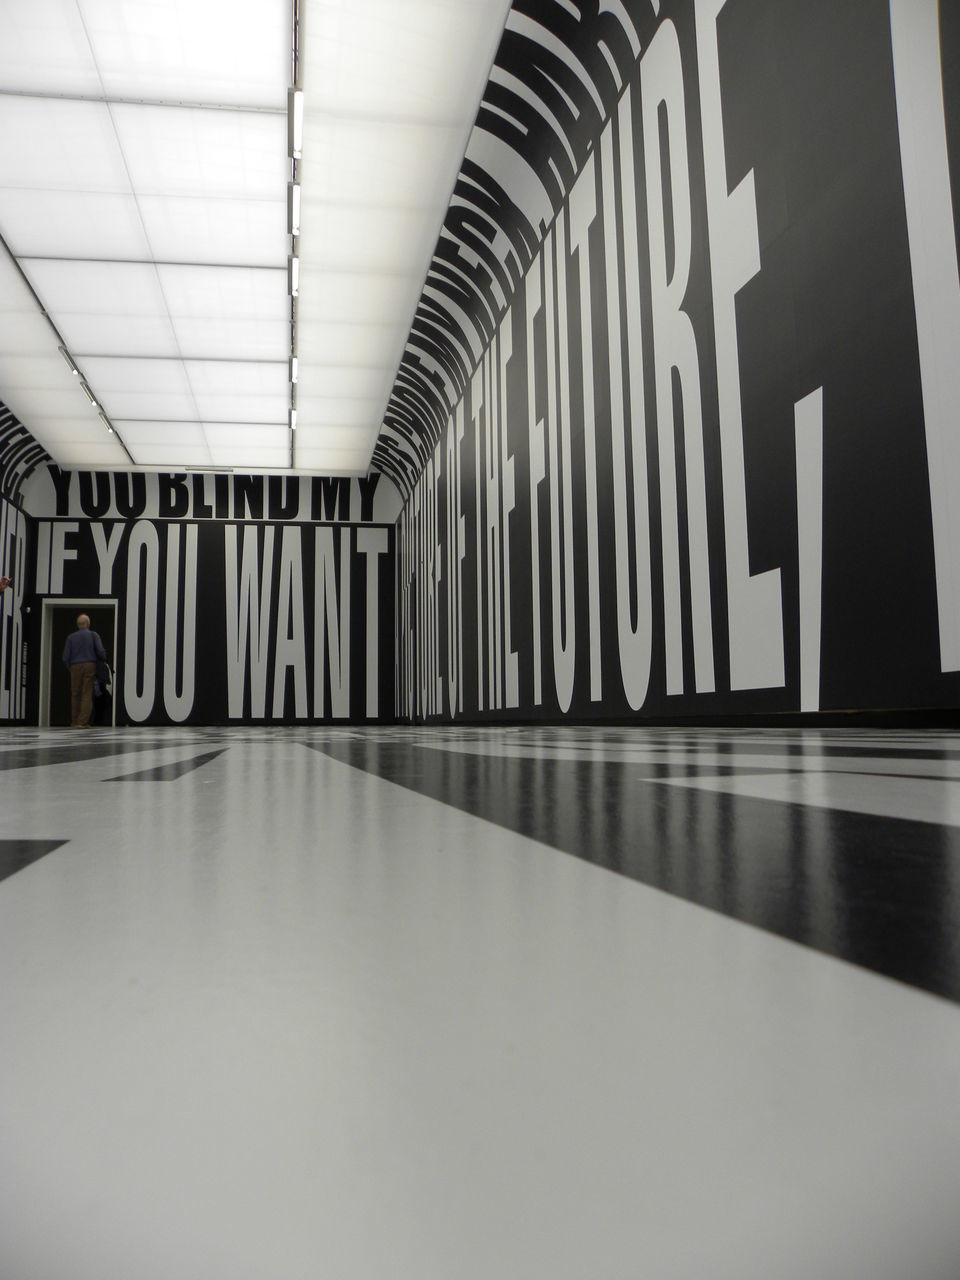 indoors, empty, no people, communication, architecture, modern, illuminated, day, close-up